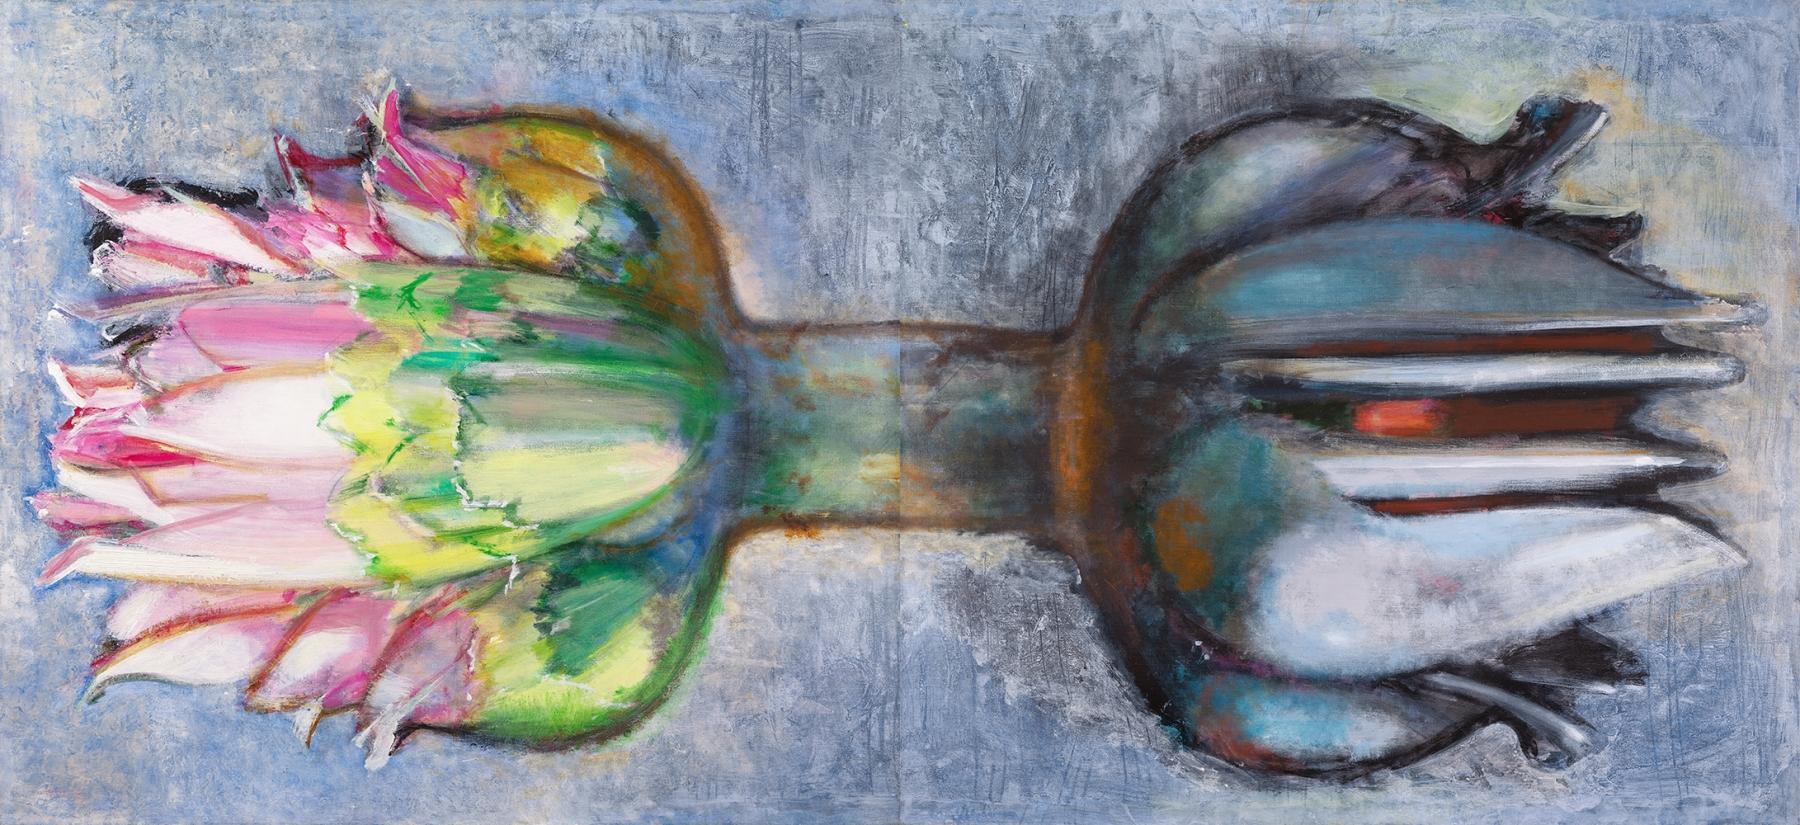 Morton Kaish, Delicate Balance, 2018, Acrylic on Linen,88h x 96w inches